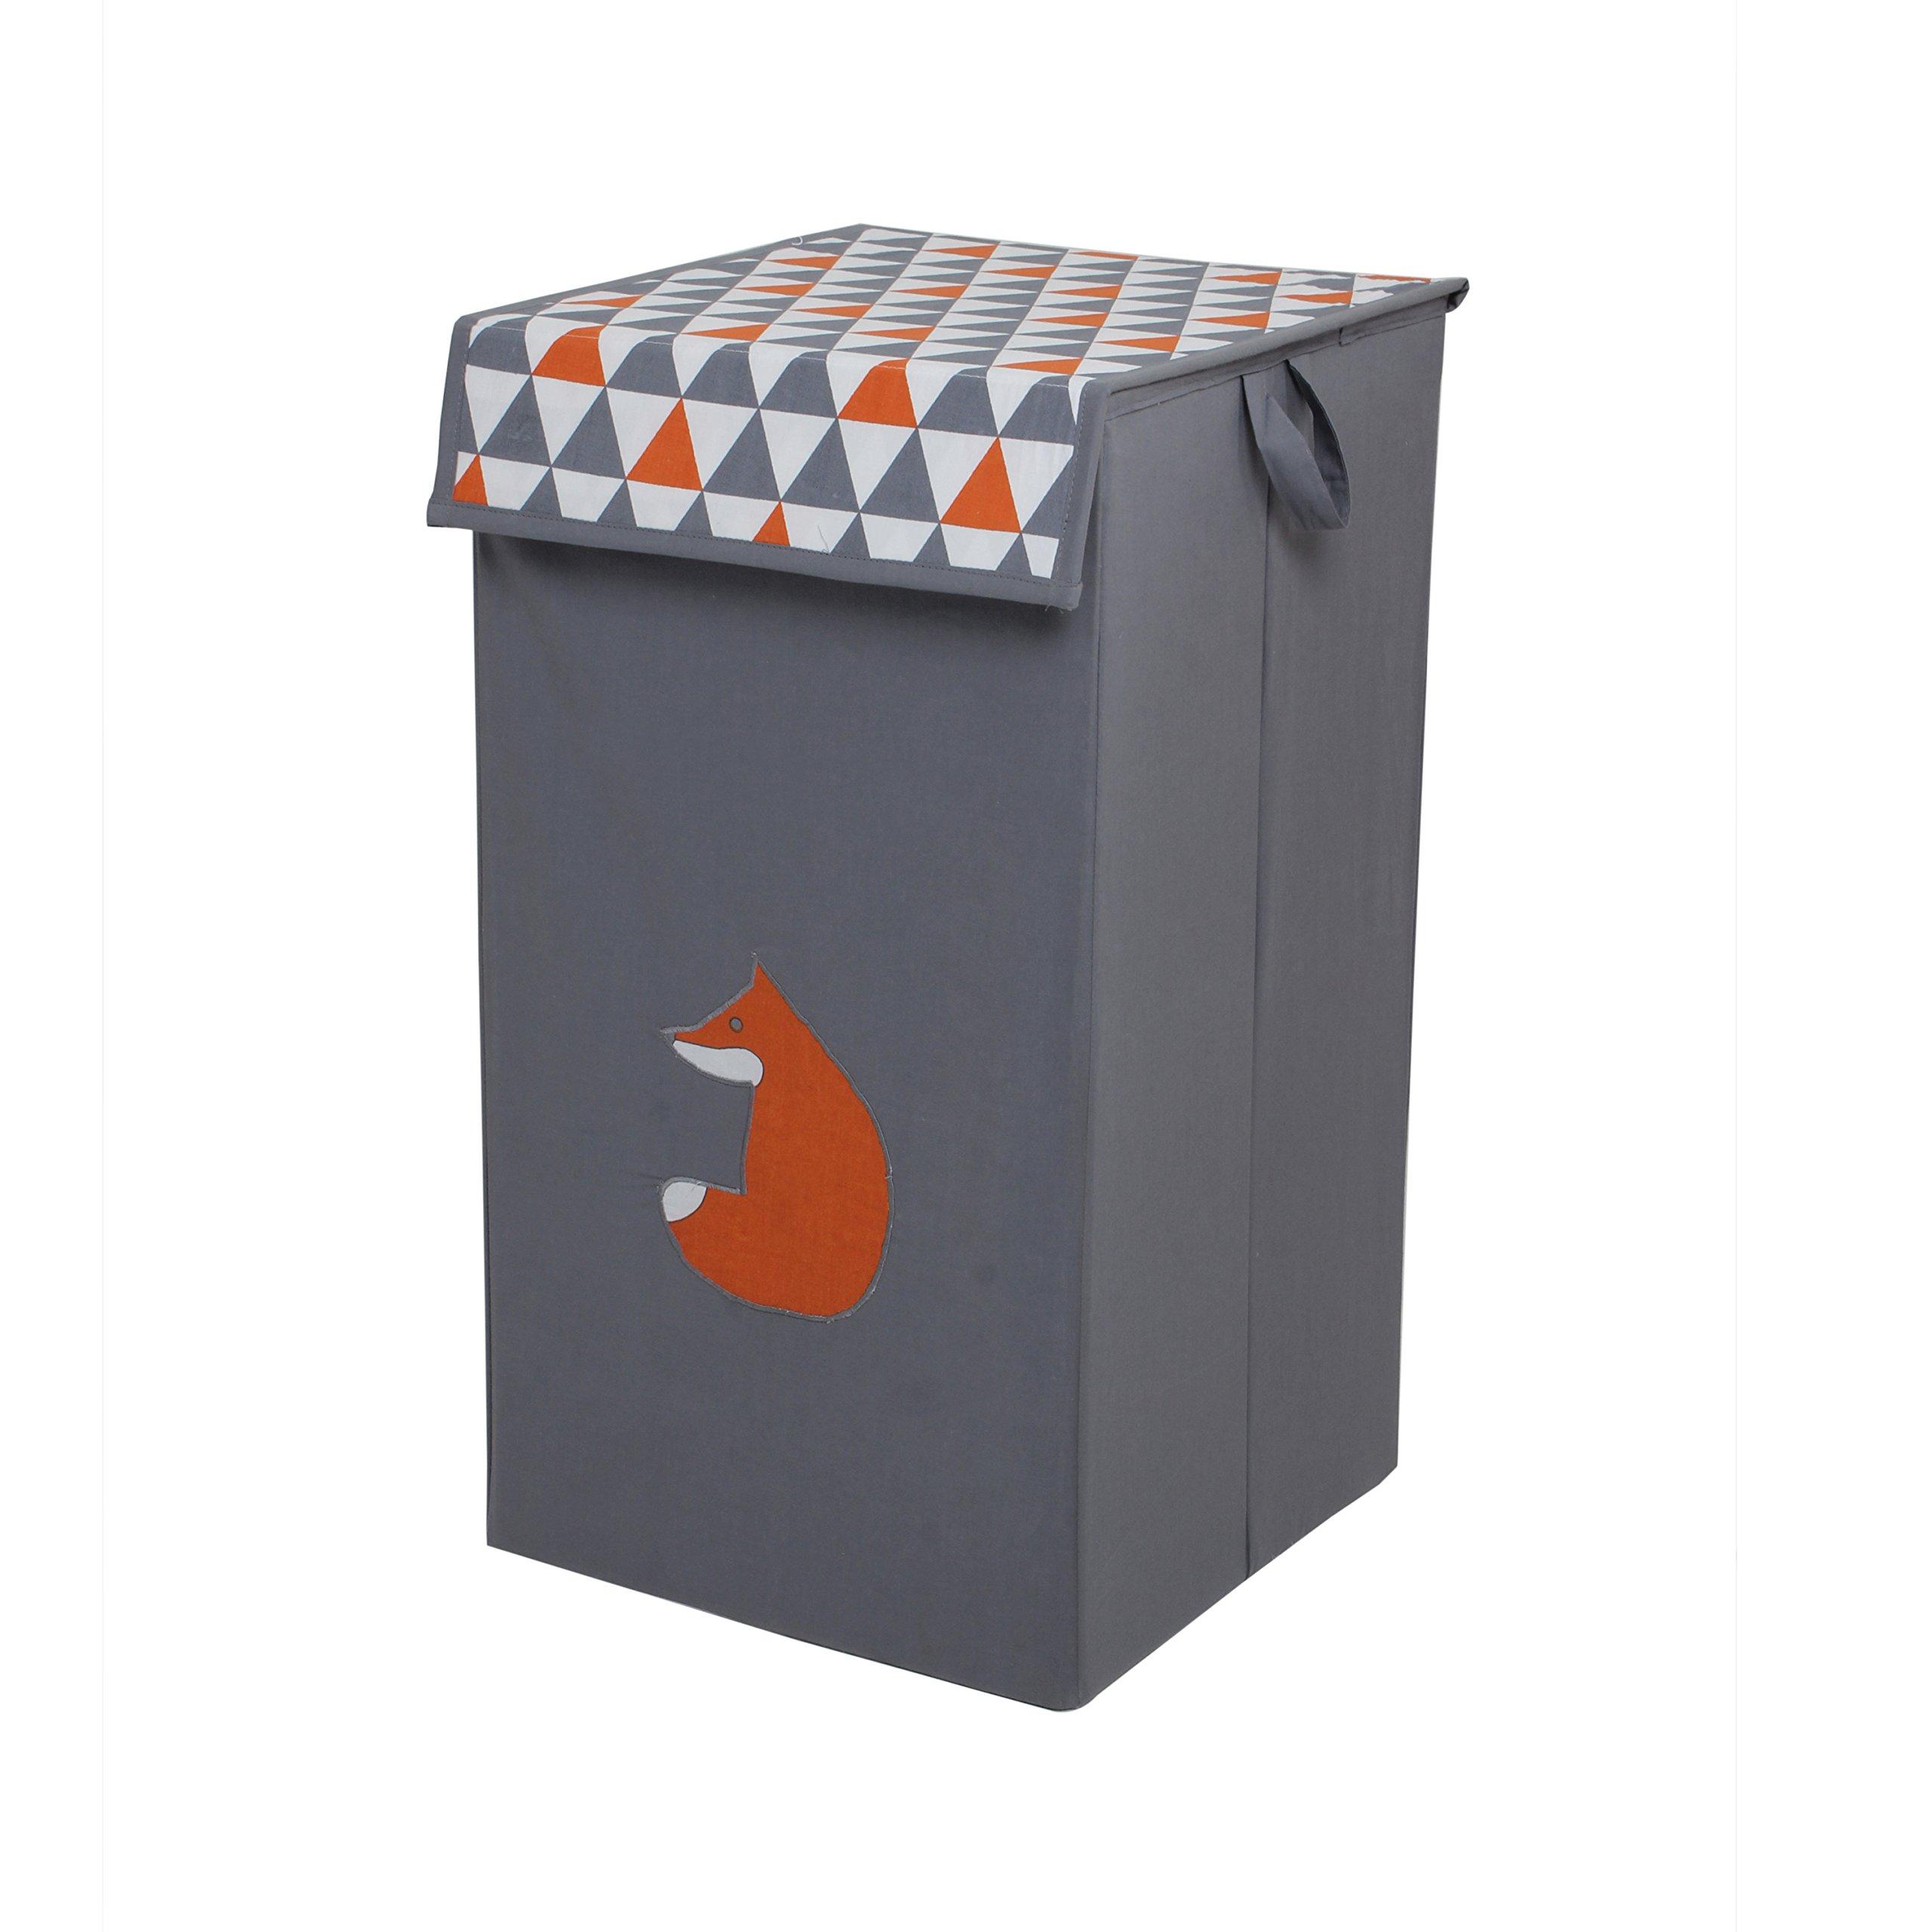 Bacati - Playful Foxs Orange/grey Hamper Collapsible